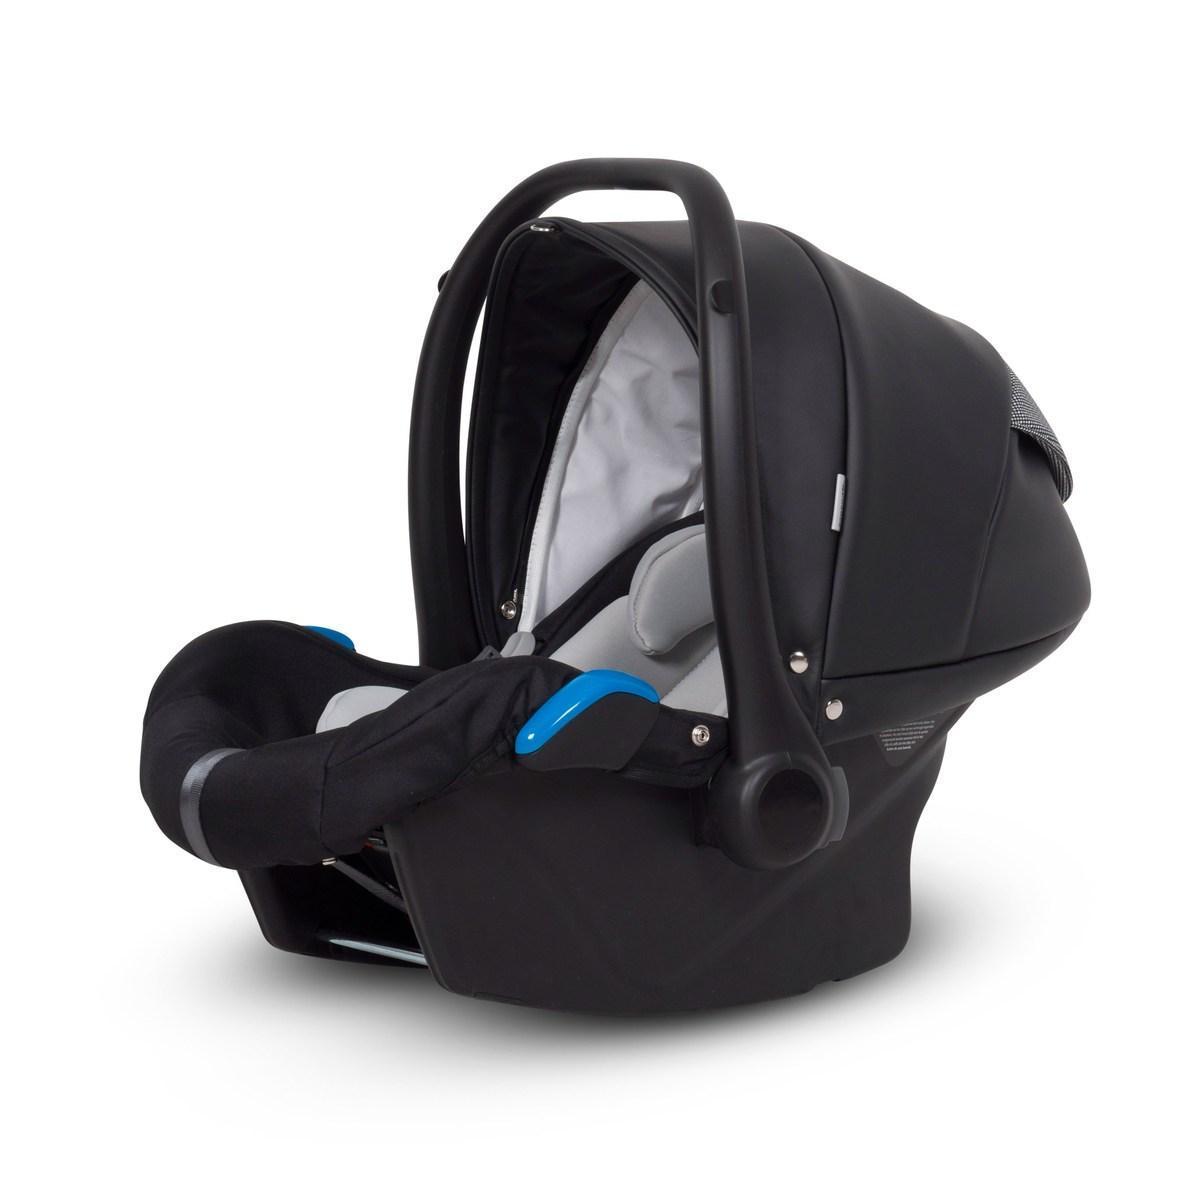 Детское автокресло Expander Xenon 04 Carbon